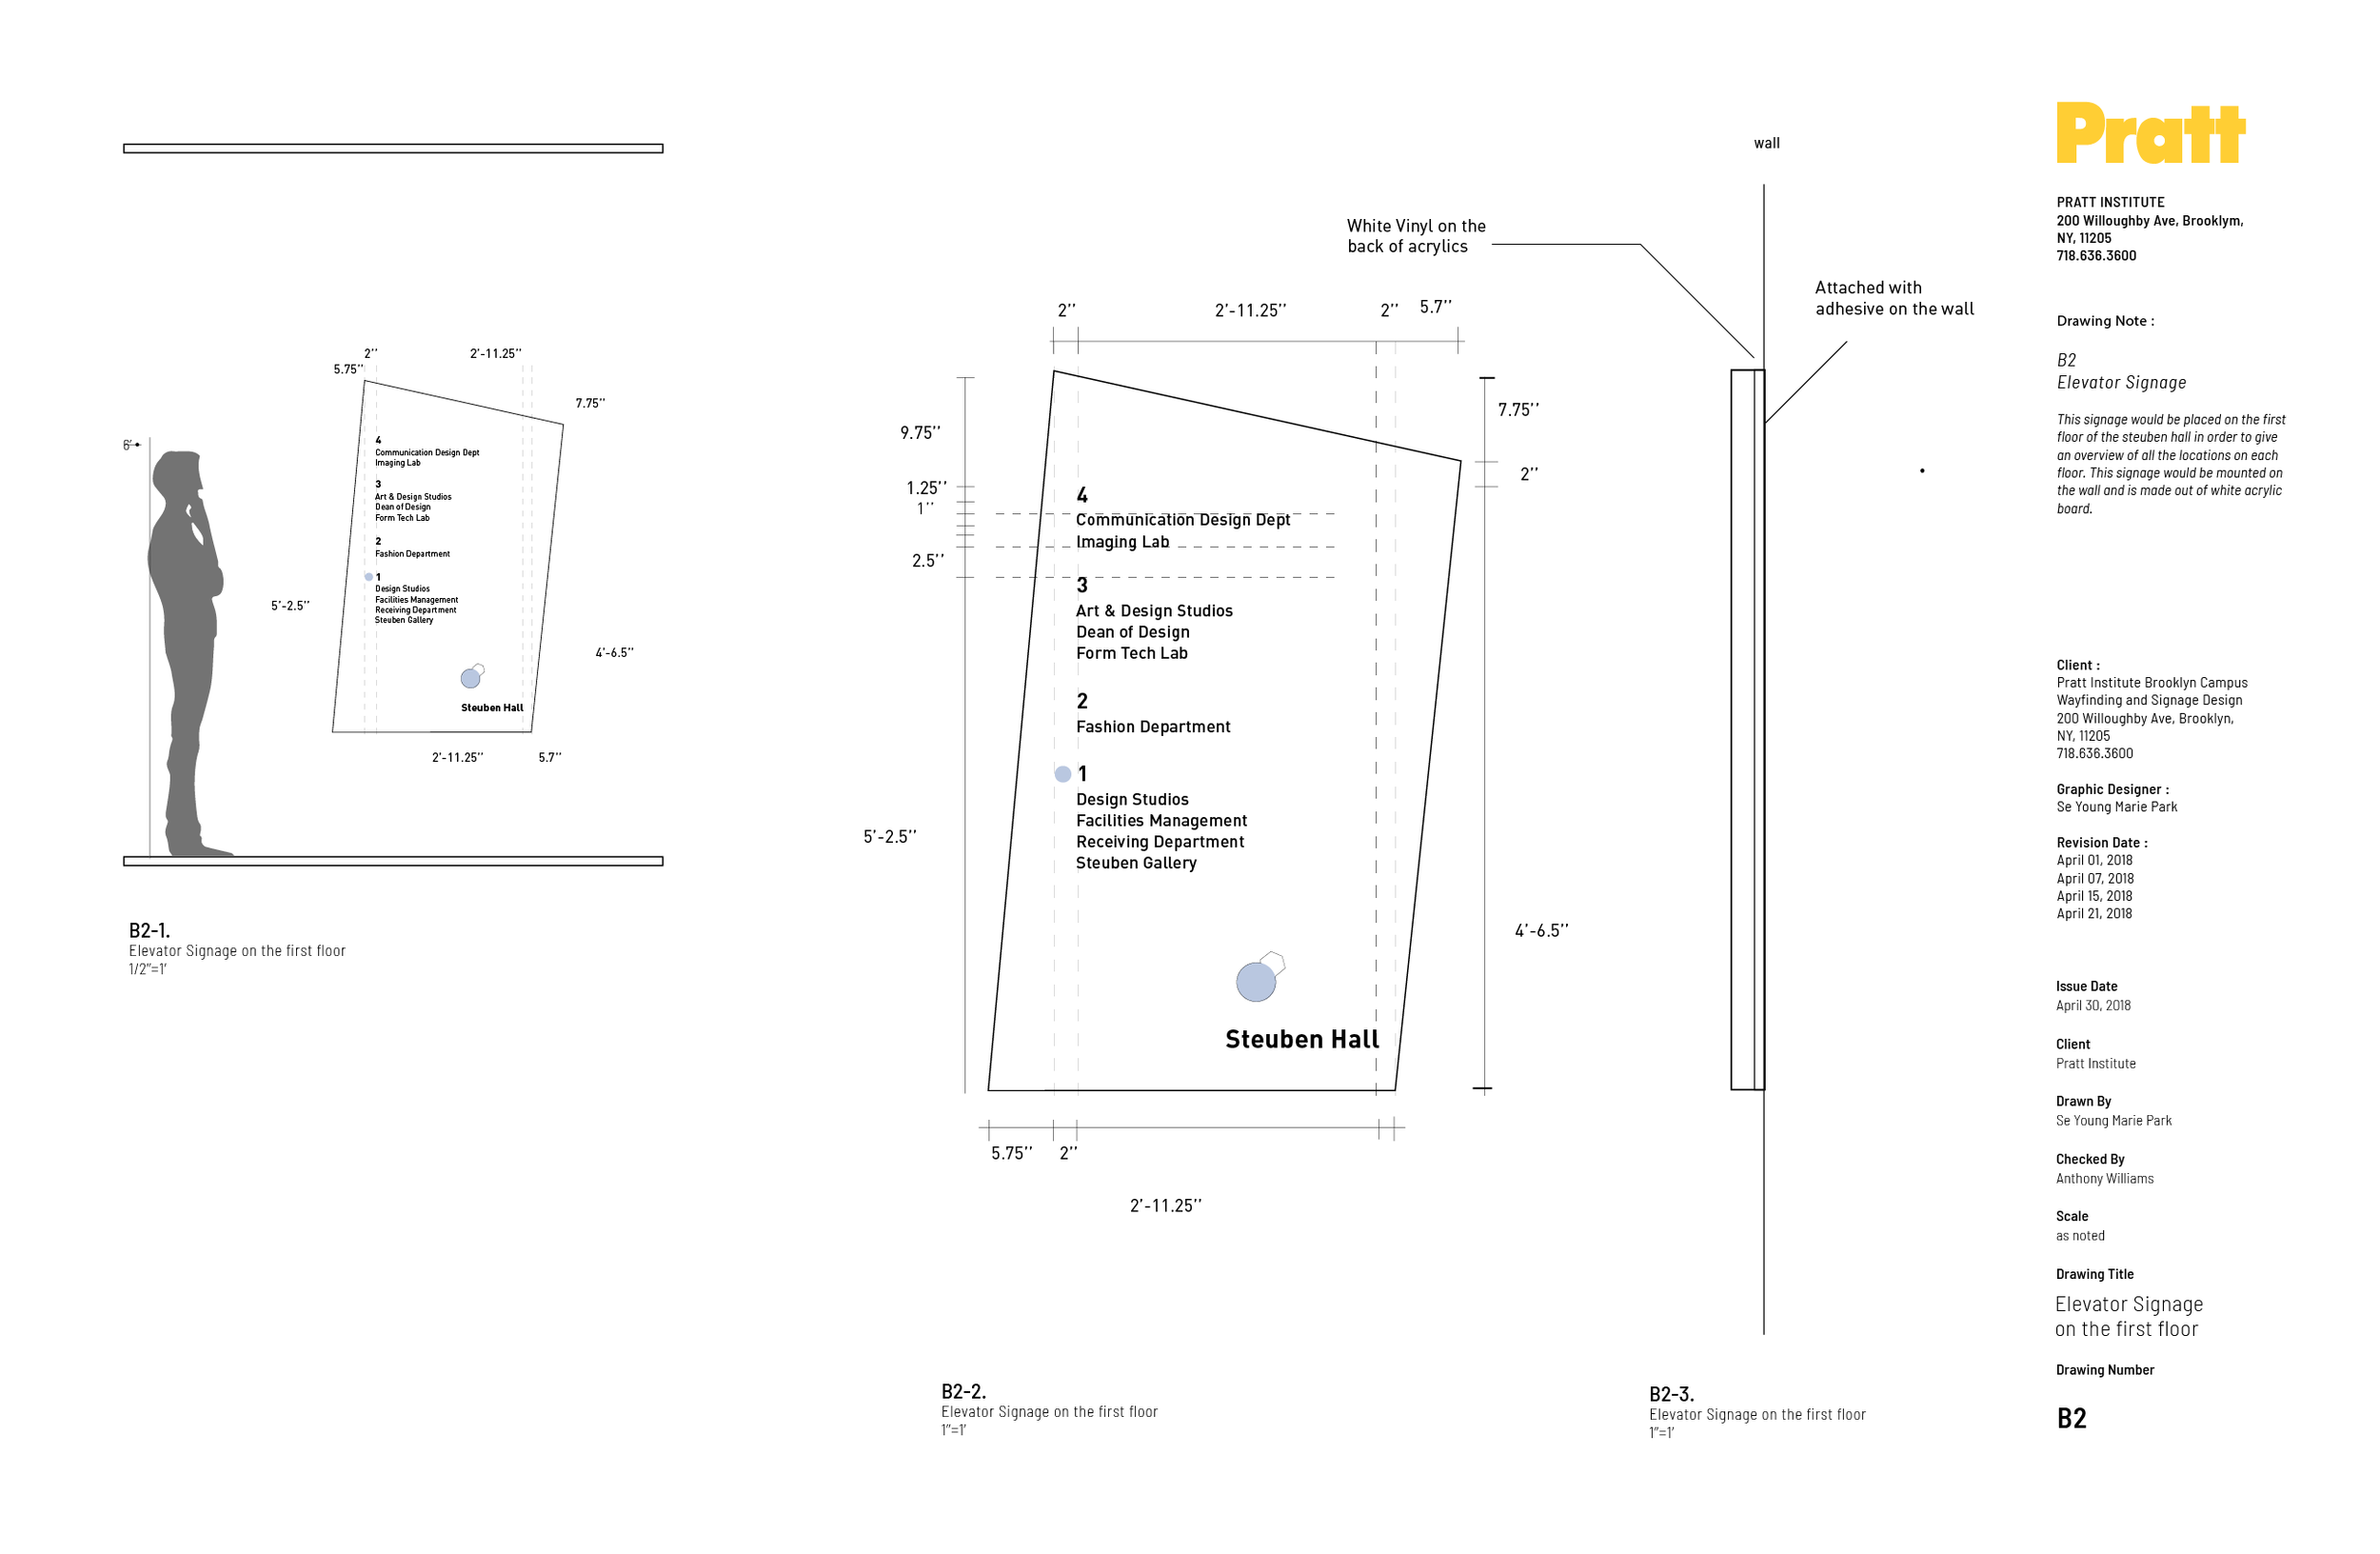 Pratt_Wayfinding_Signage_Design-10.png